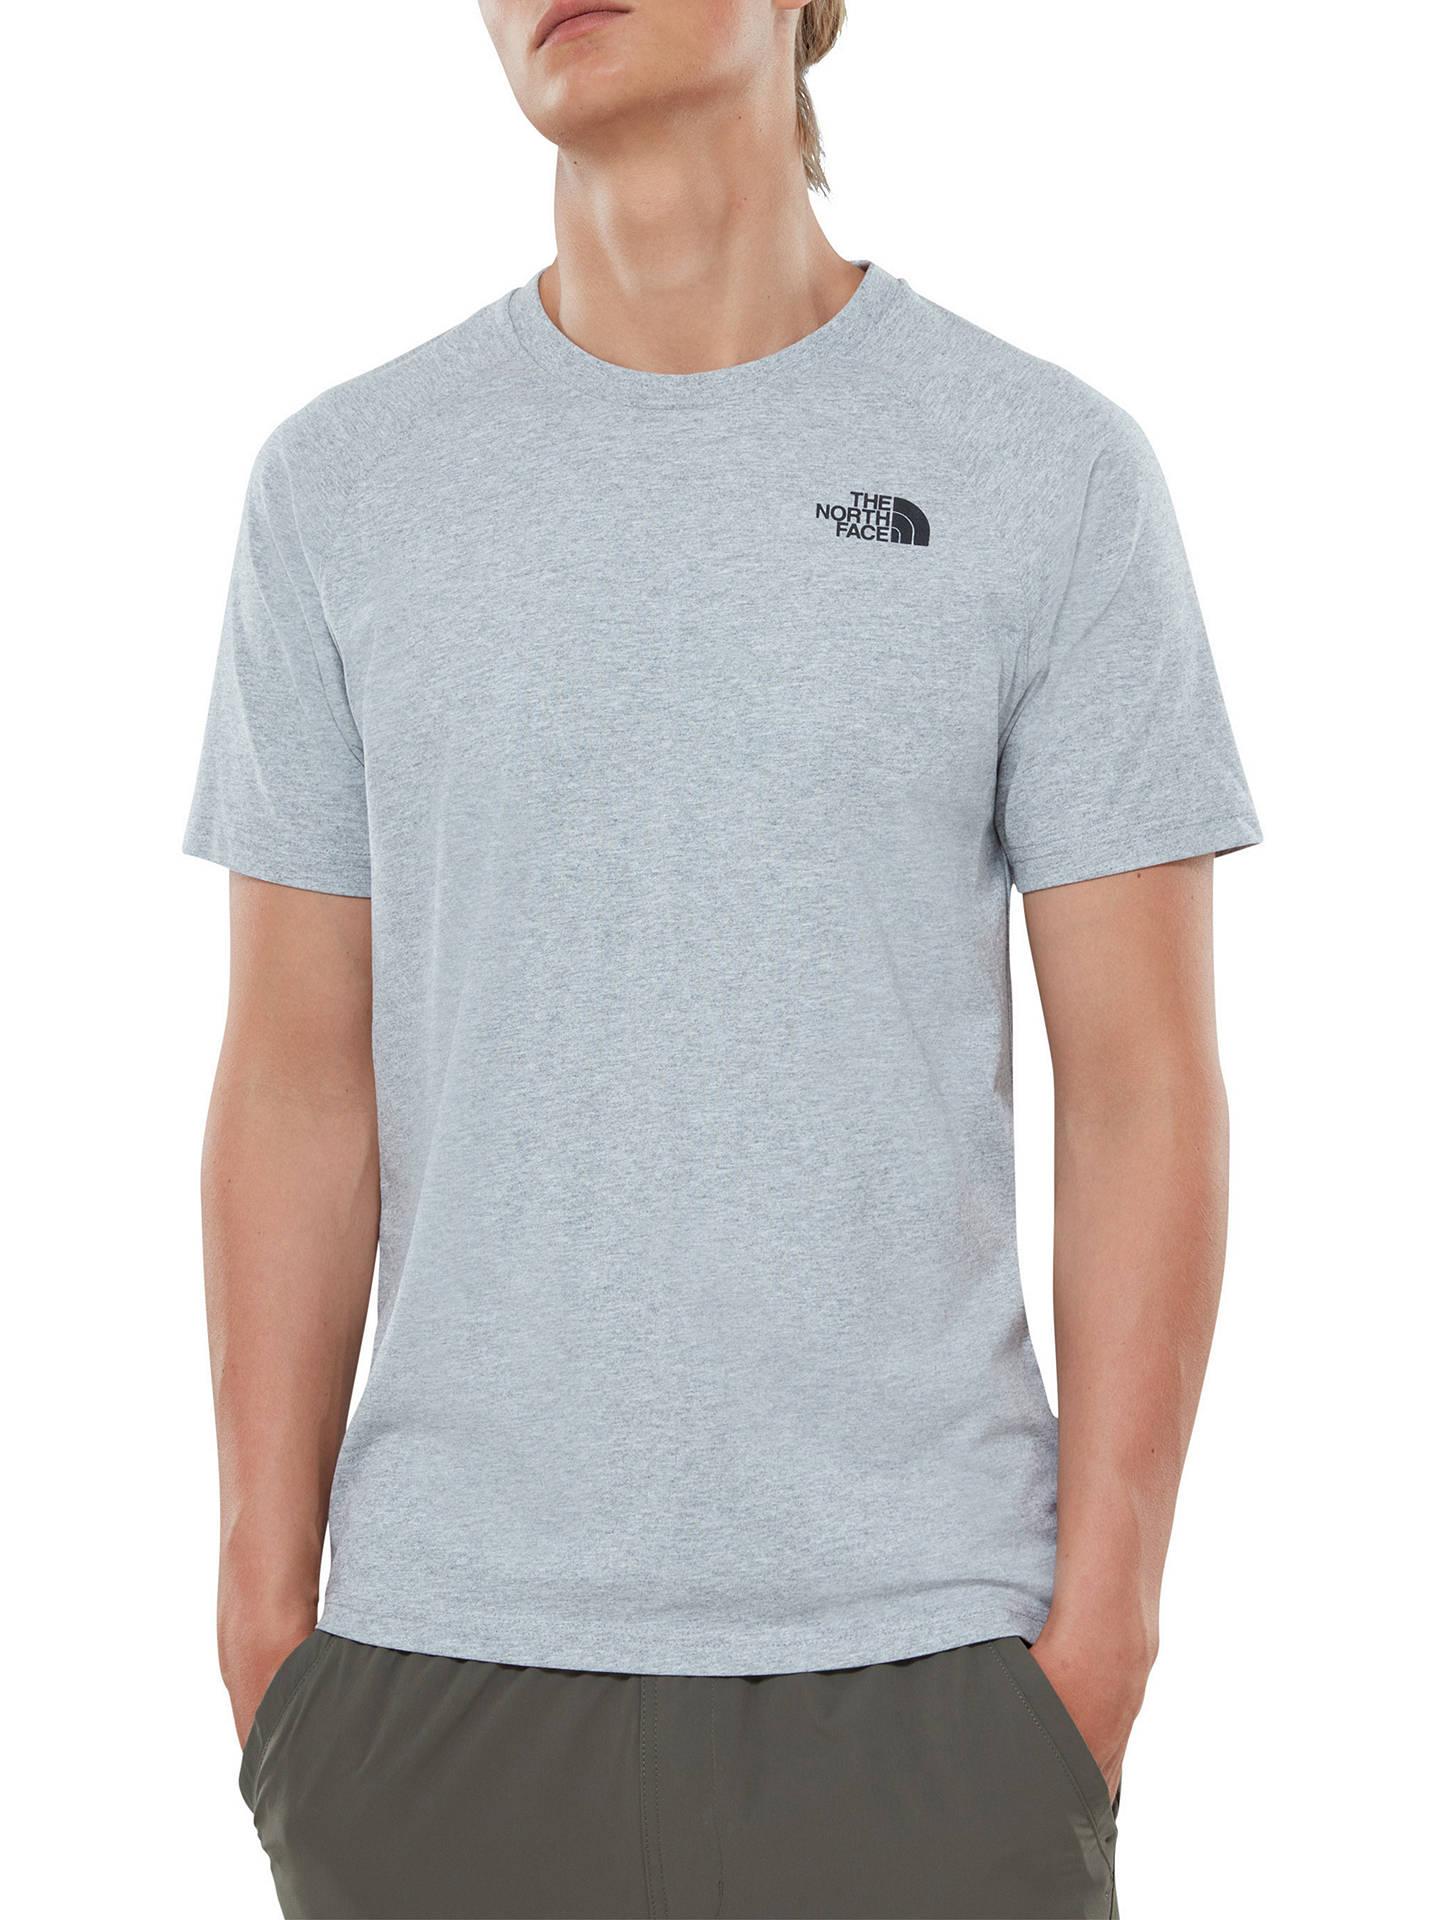 b97eebf0d The North Face Raglan T-Shirt, Light Grey Heath at John Lewis & Partners